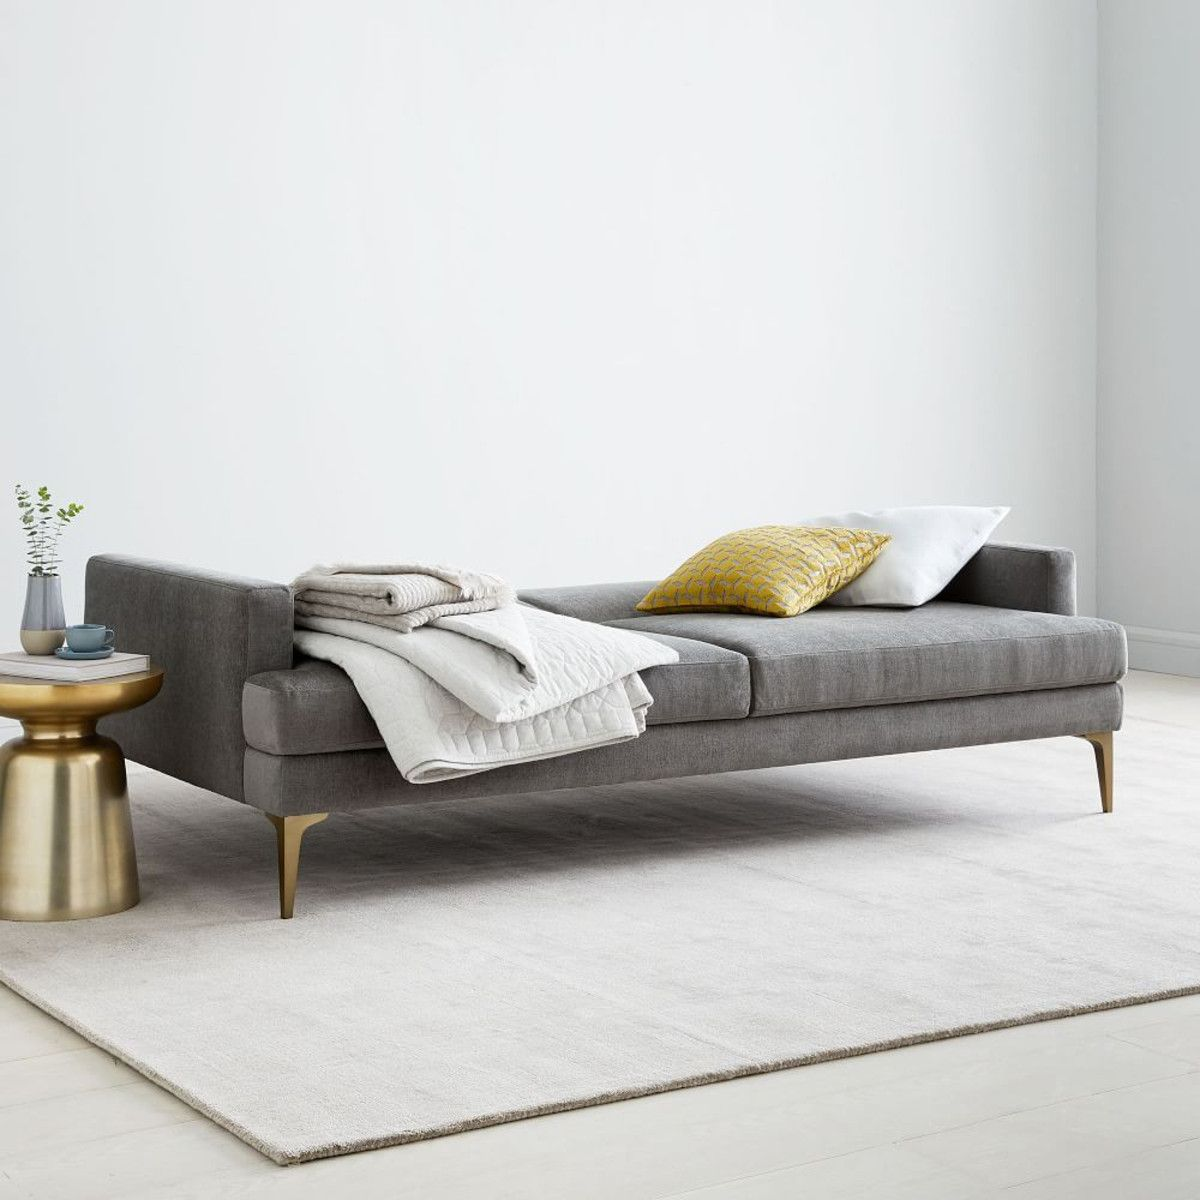 Andes Double Sofa Bed (212 cm) Sleeper sofa, Futon sofa